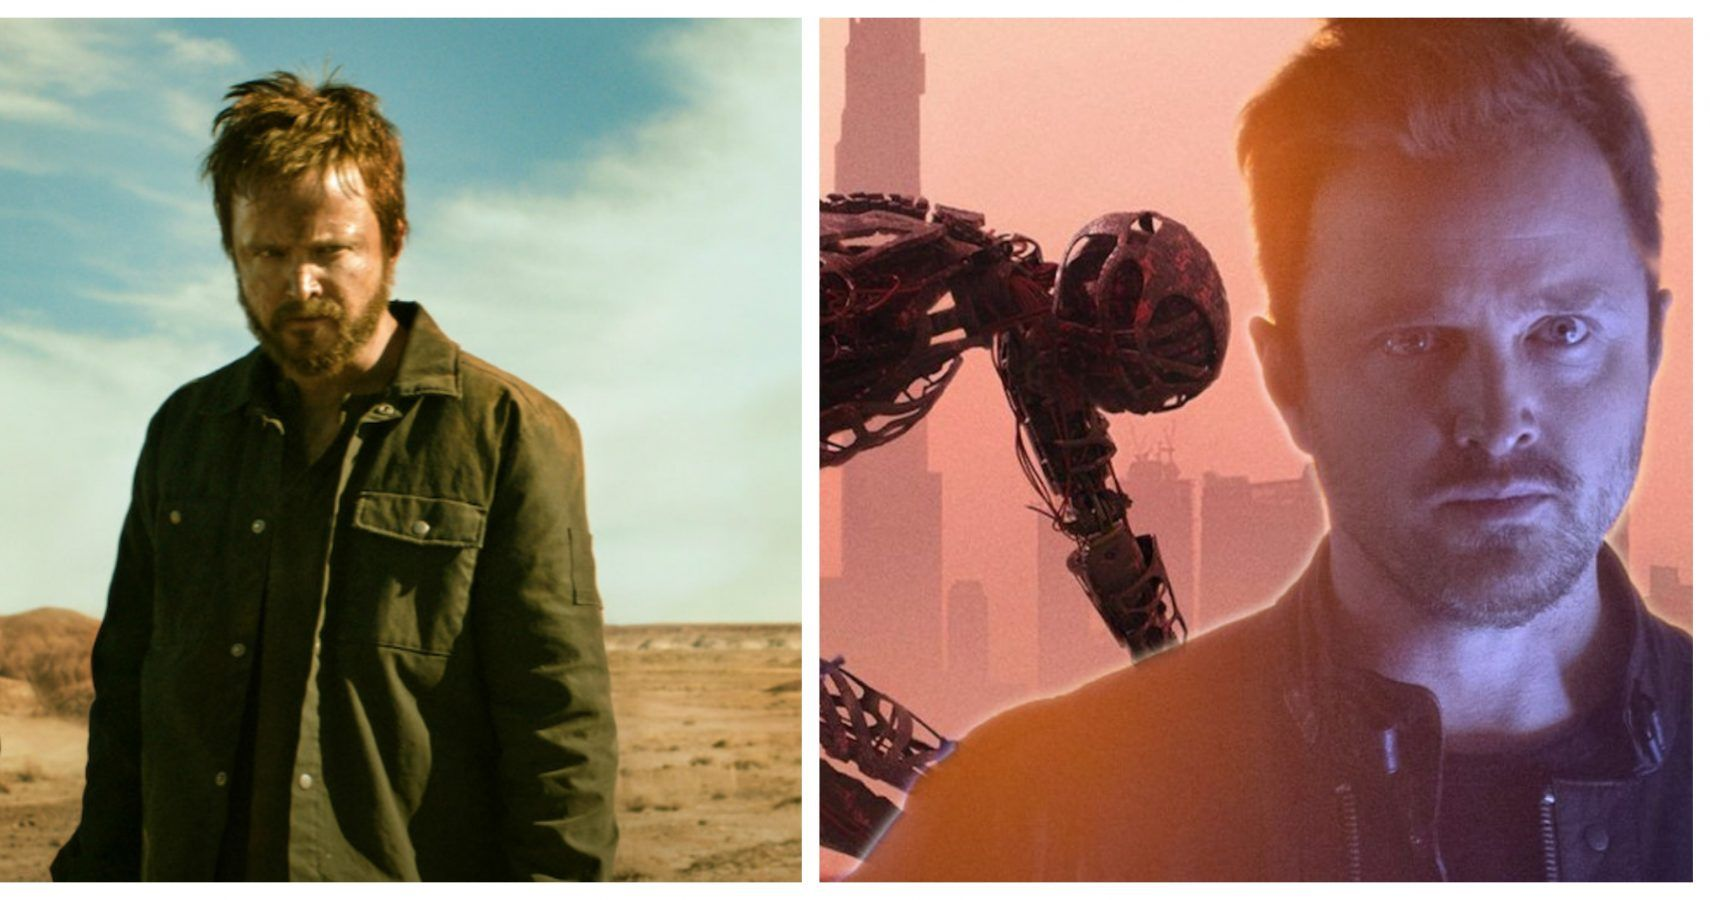 Aaron Paul: His 5 Best (& 5 Worst) Roles According To IMDb